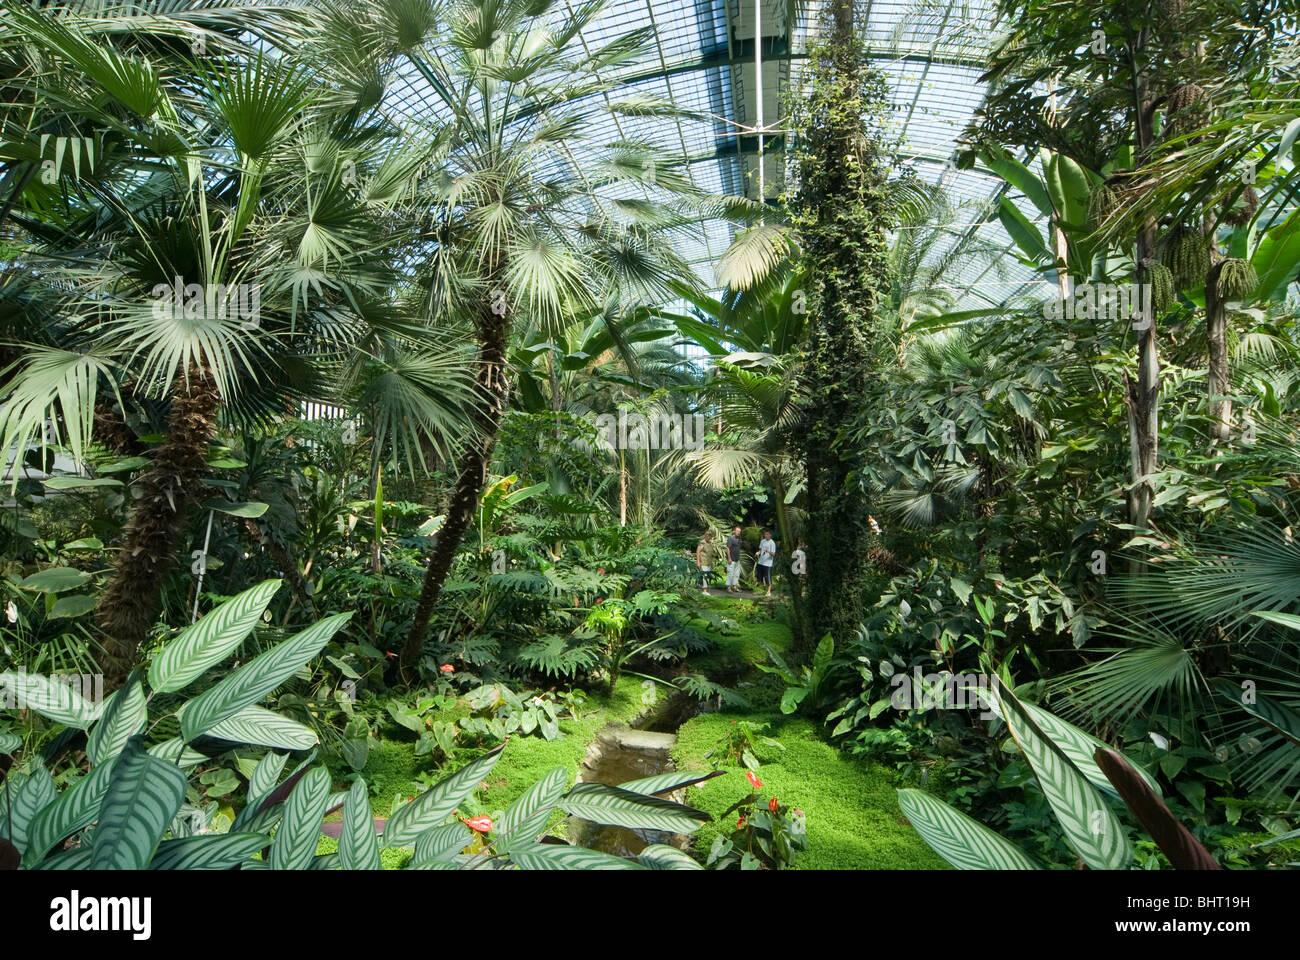 frankfurt botanical garden stockfotos frankfurt botanical garden bilder alamy. Black Bedroom Furniture Sets. Home Design Ideas